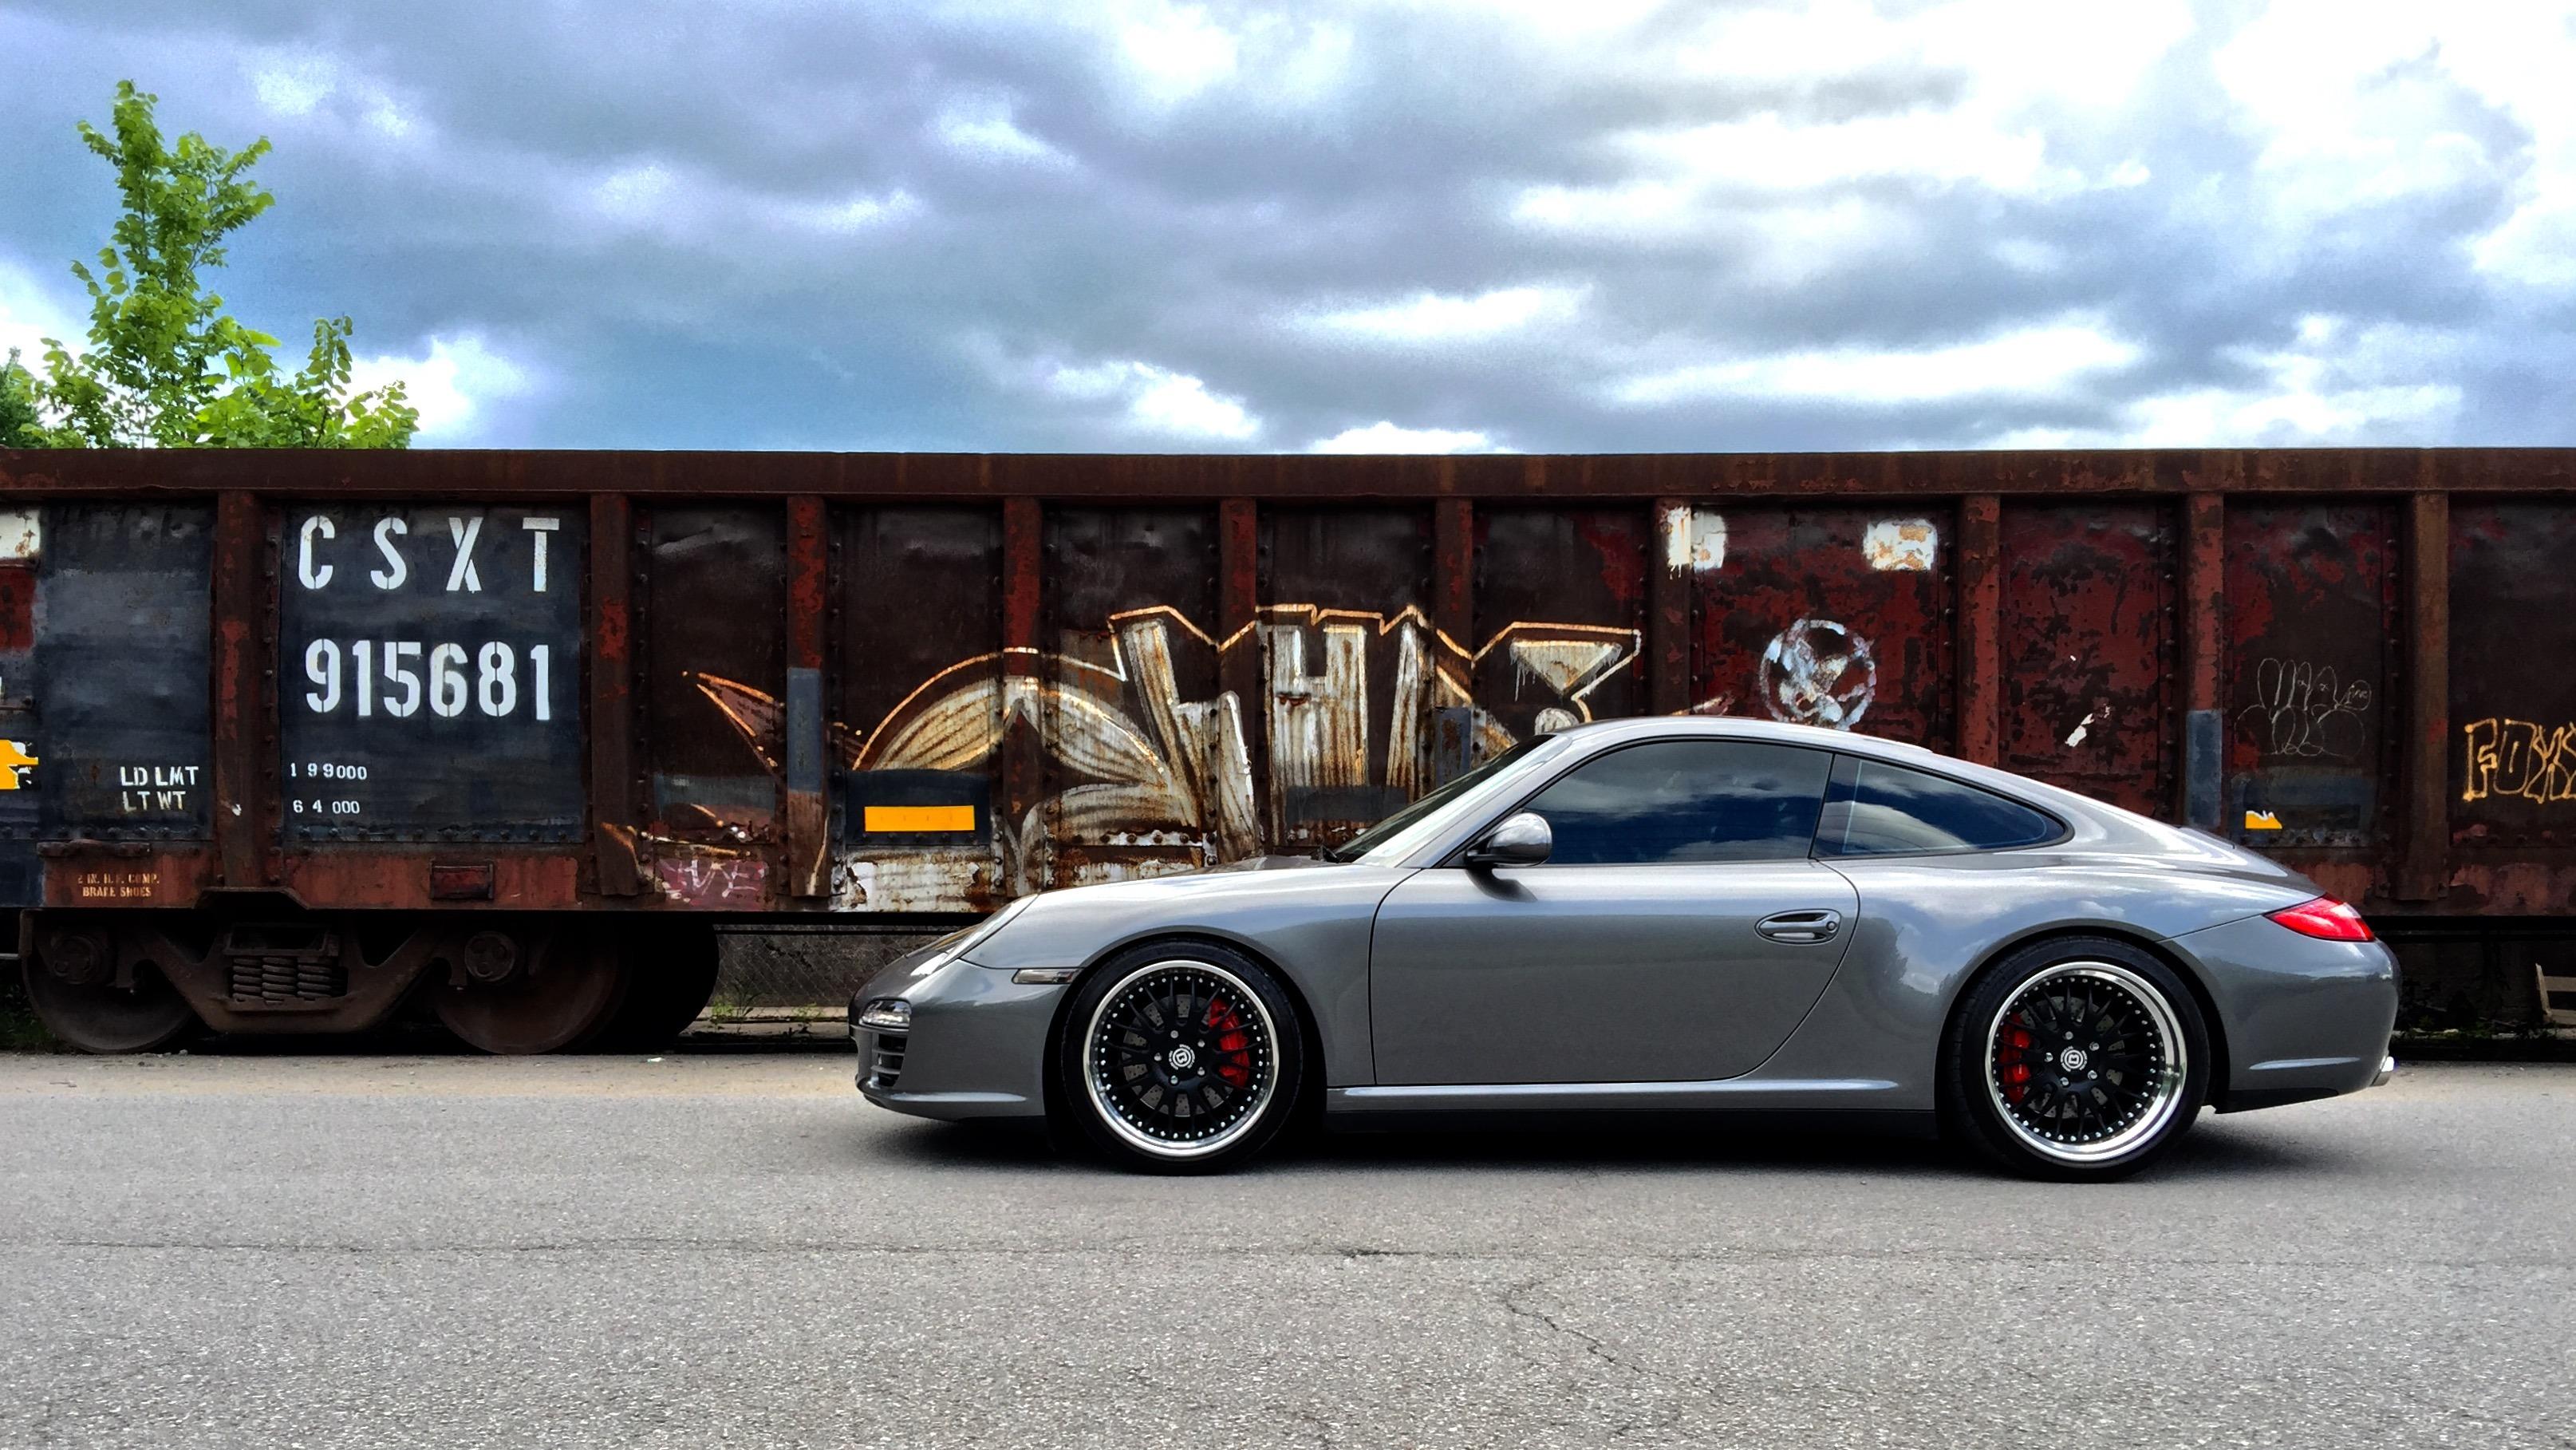 Ecs Nation Jason S 2009 Porsche 997 911 Carrera 4s Ecs Tuning